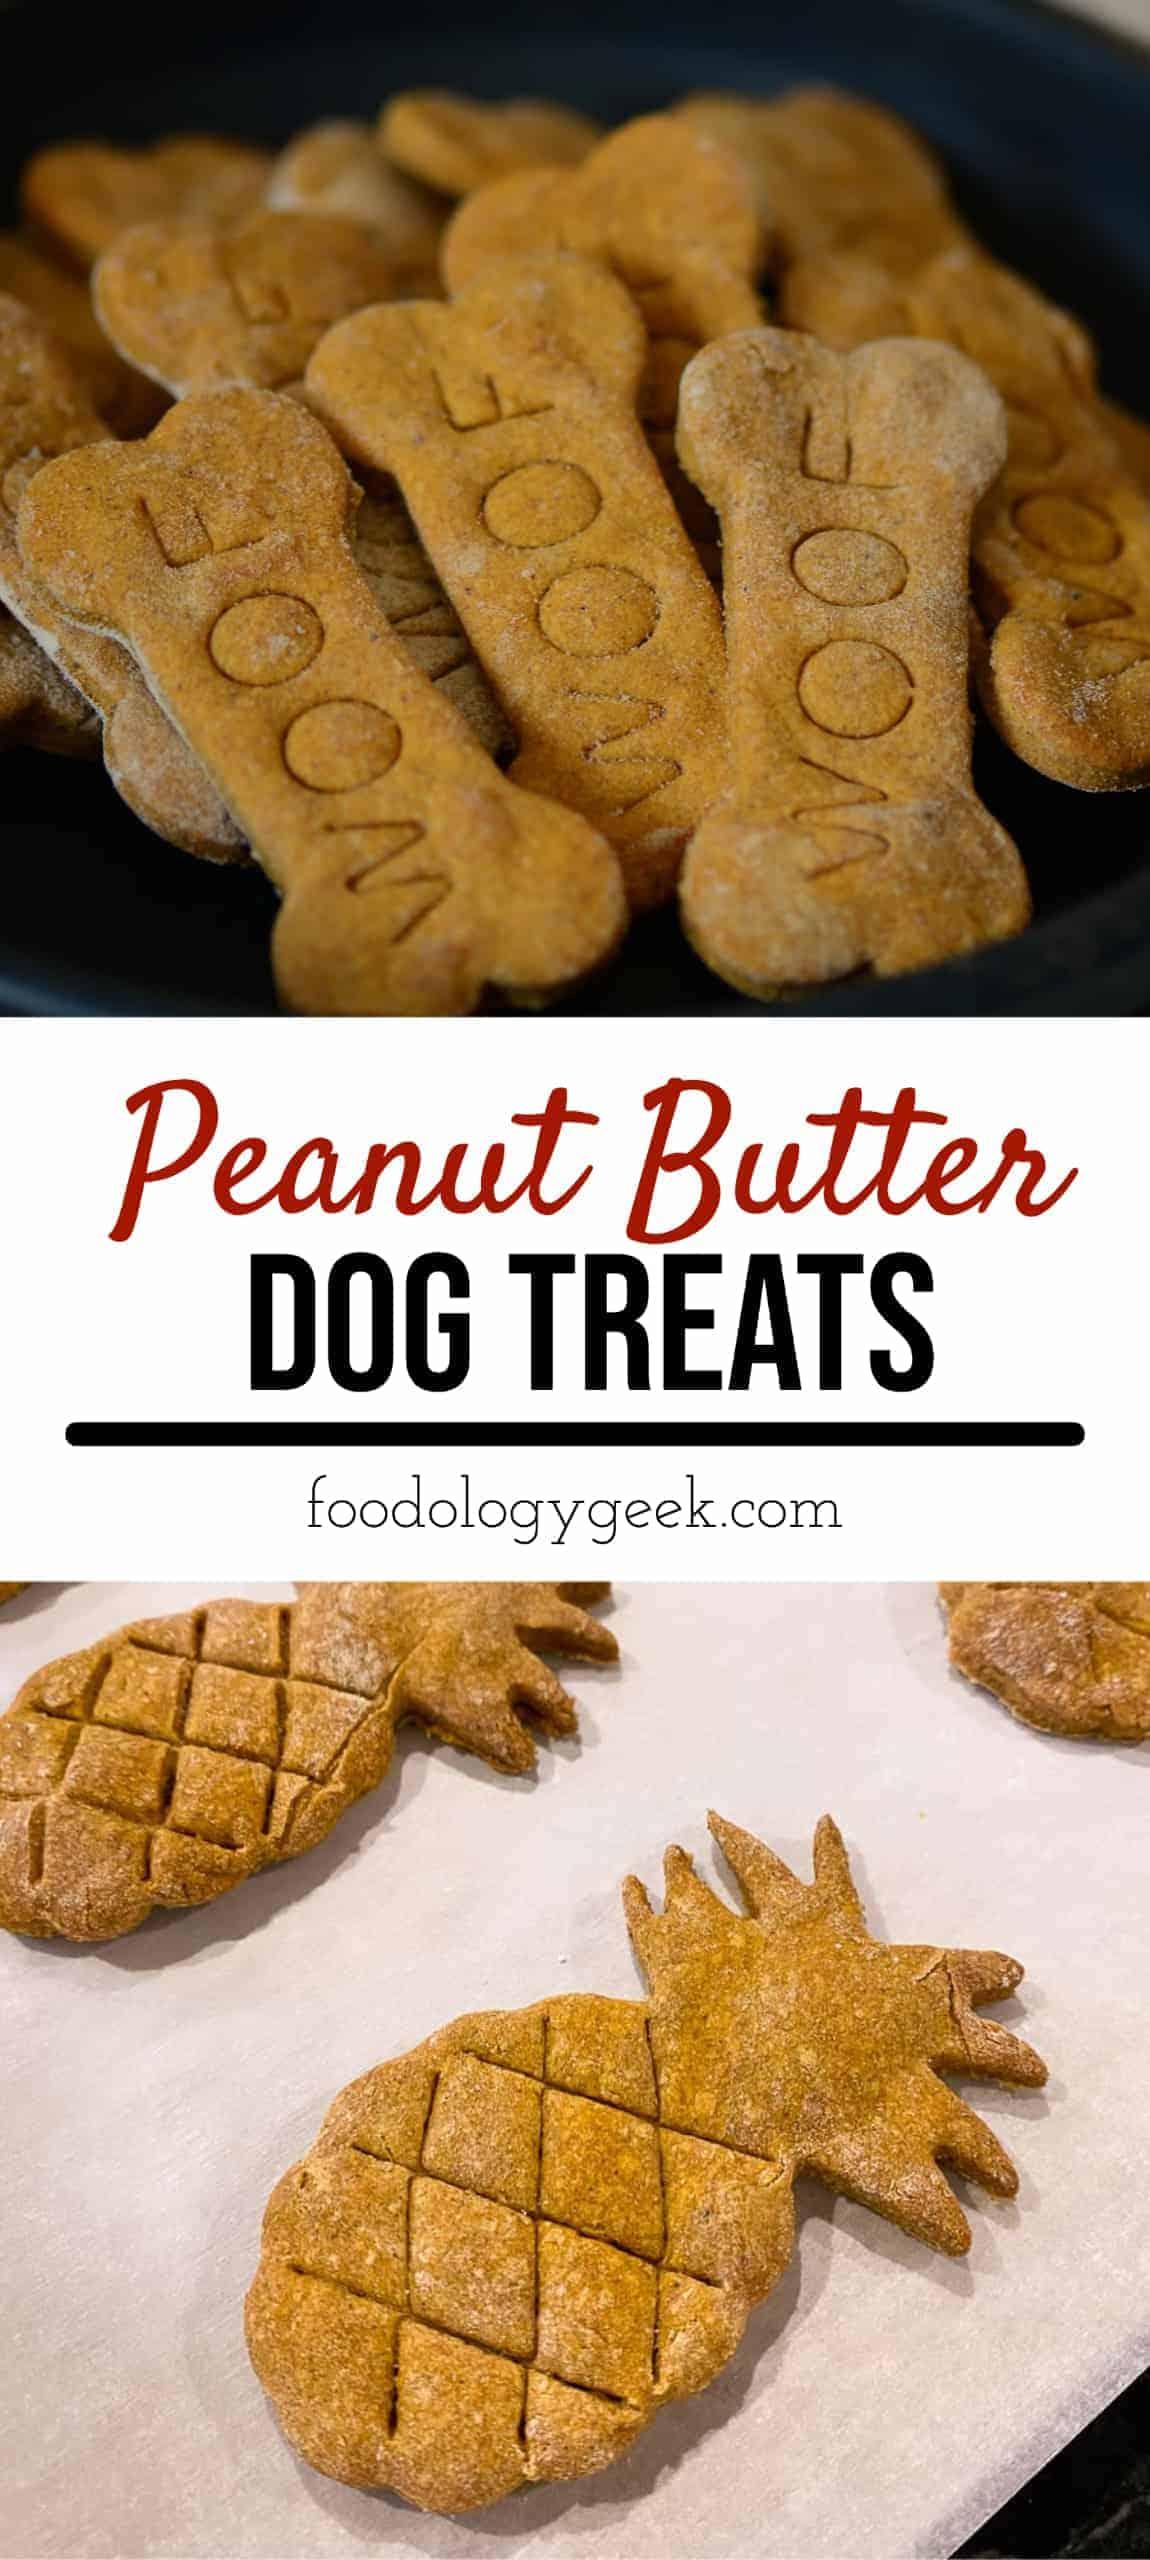 peanut butter dog treats, pinterest image by foodology geek